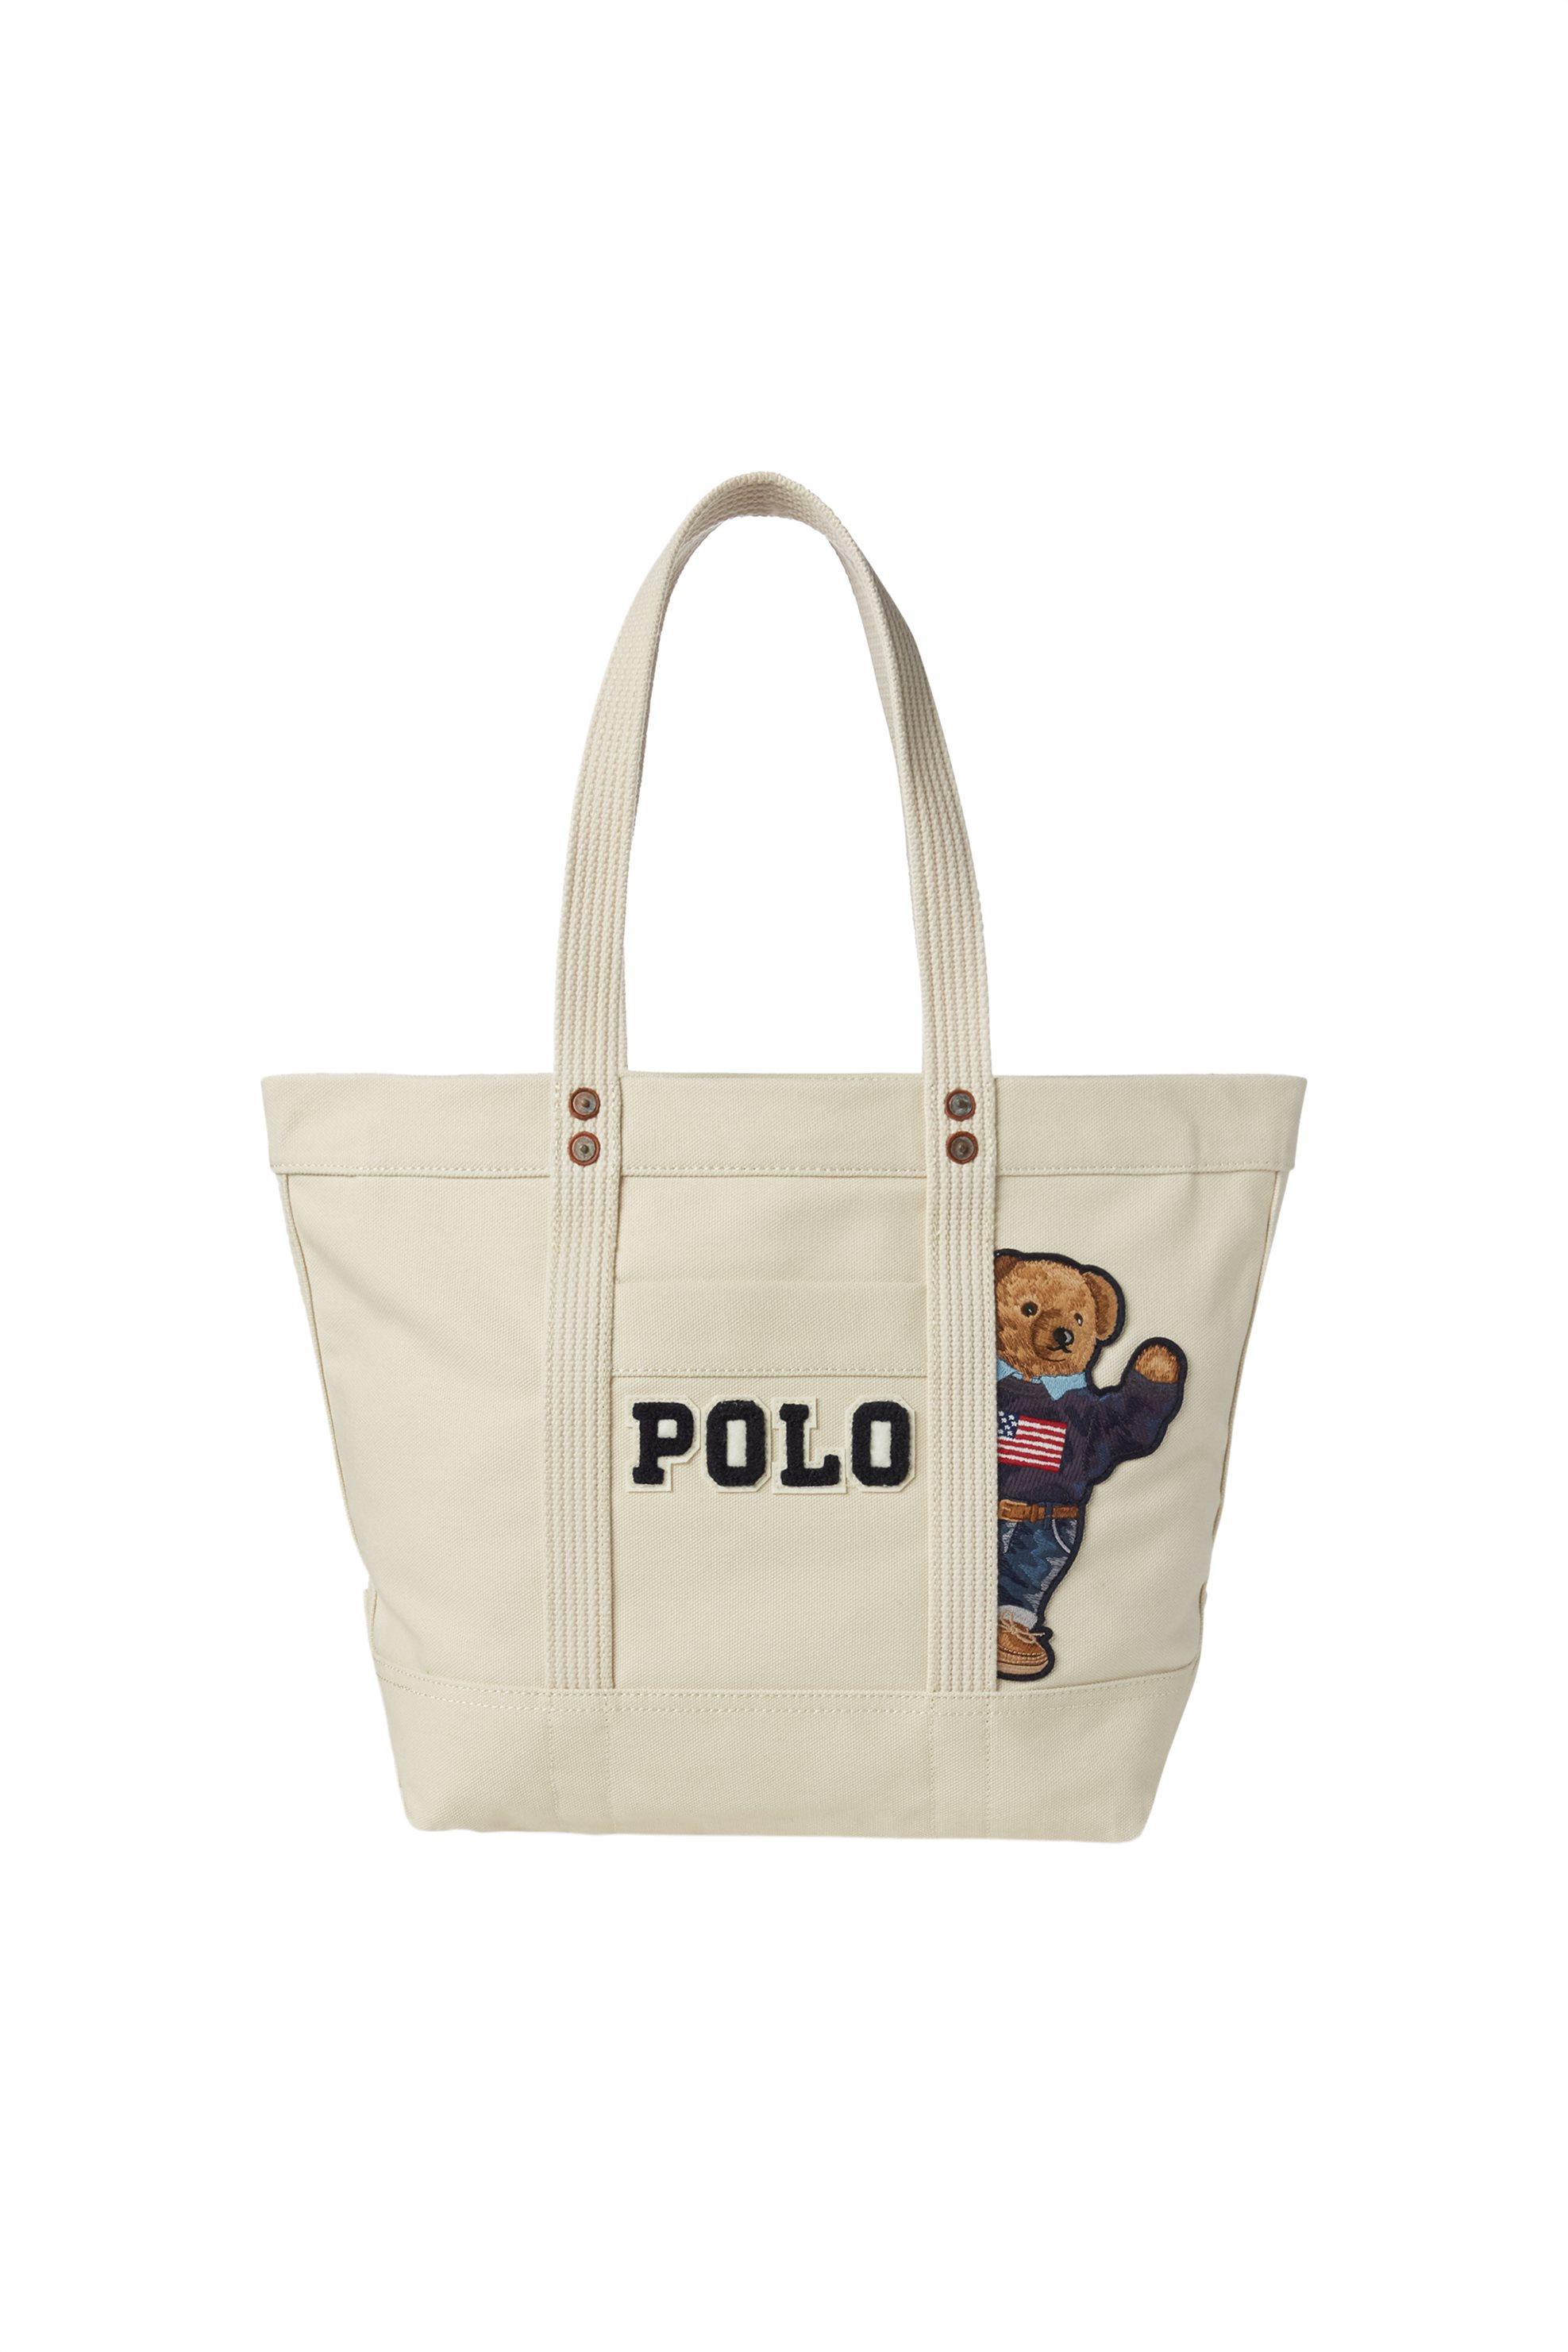 Polo Ralph Lauren γυναικεία τσάντα ώμου Canvas Polo Bear - 428746448001 - Εκρού γυναικα   τσαντεσ   ώμου   shopper bags